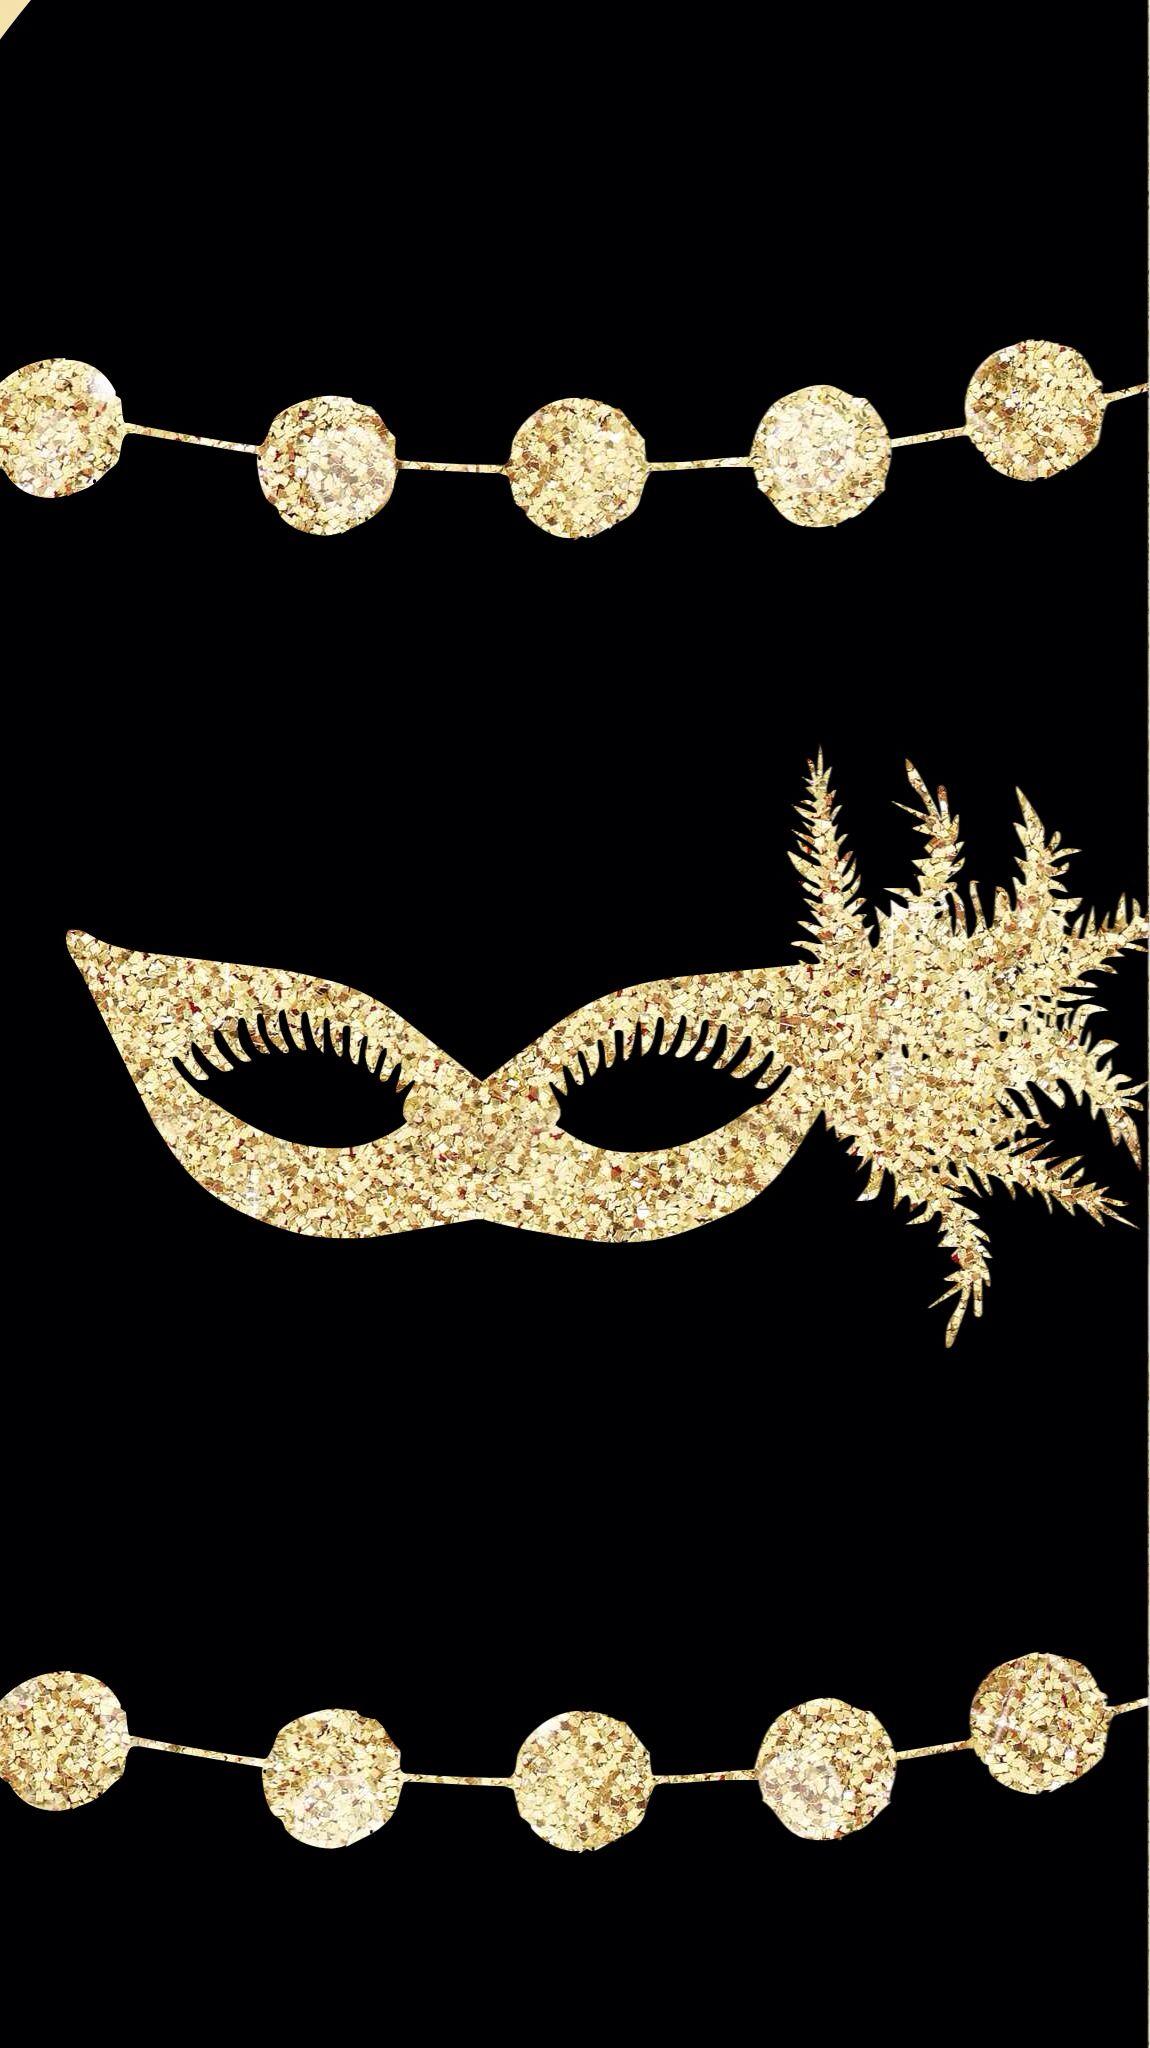 Black Gold Party Ball Mask Masquerade Iphone Wallpaper Phone